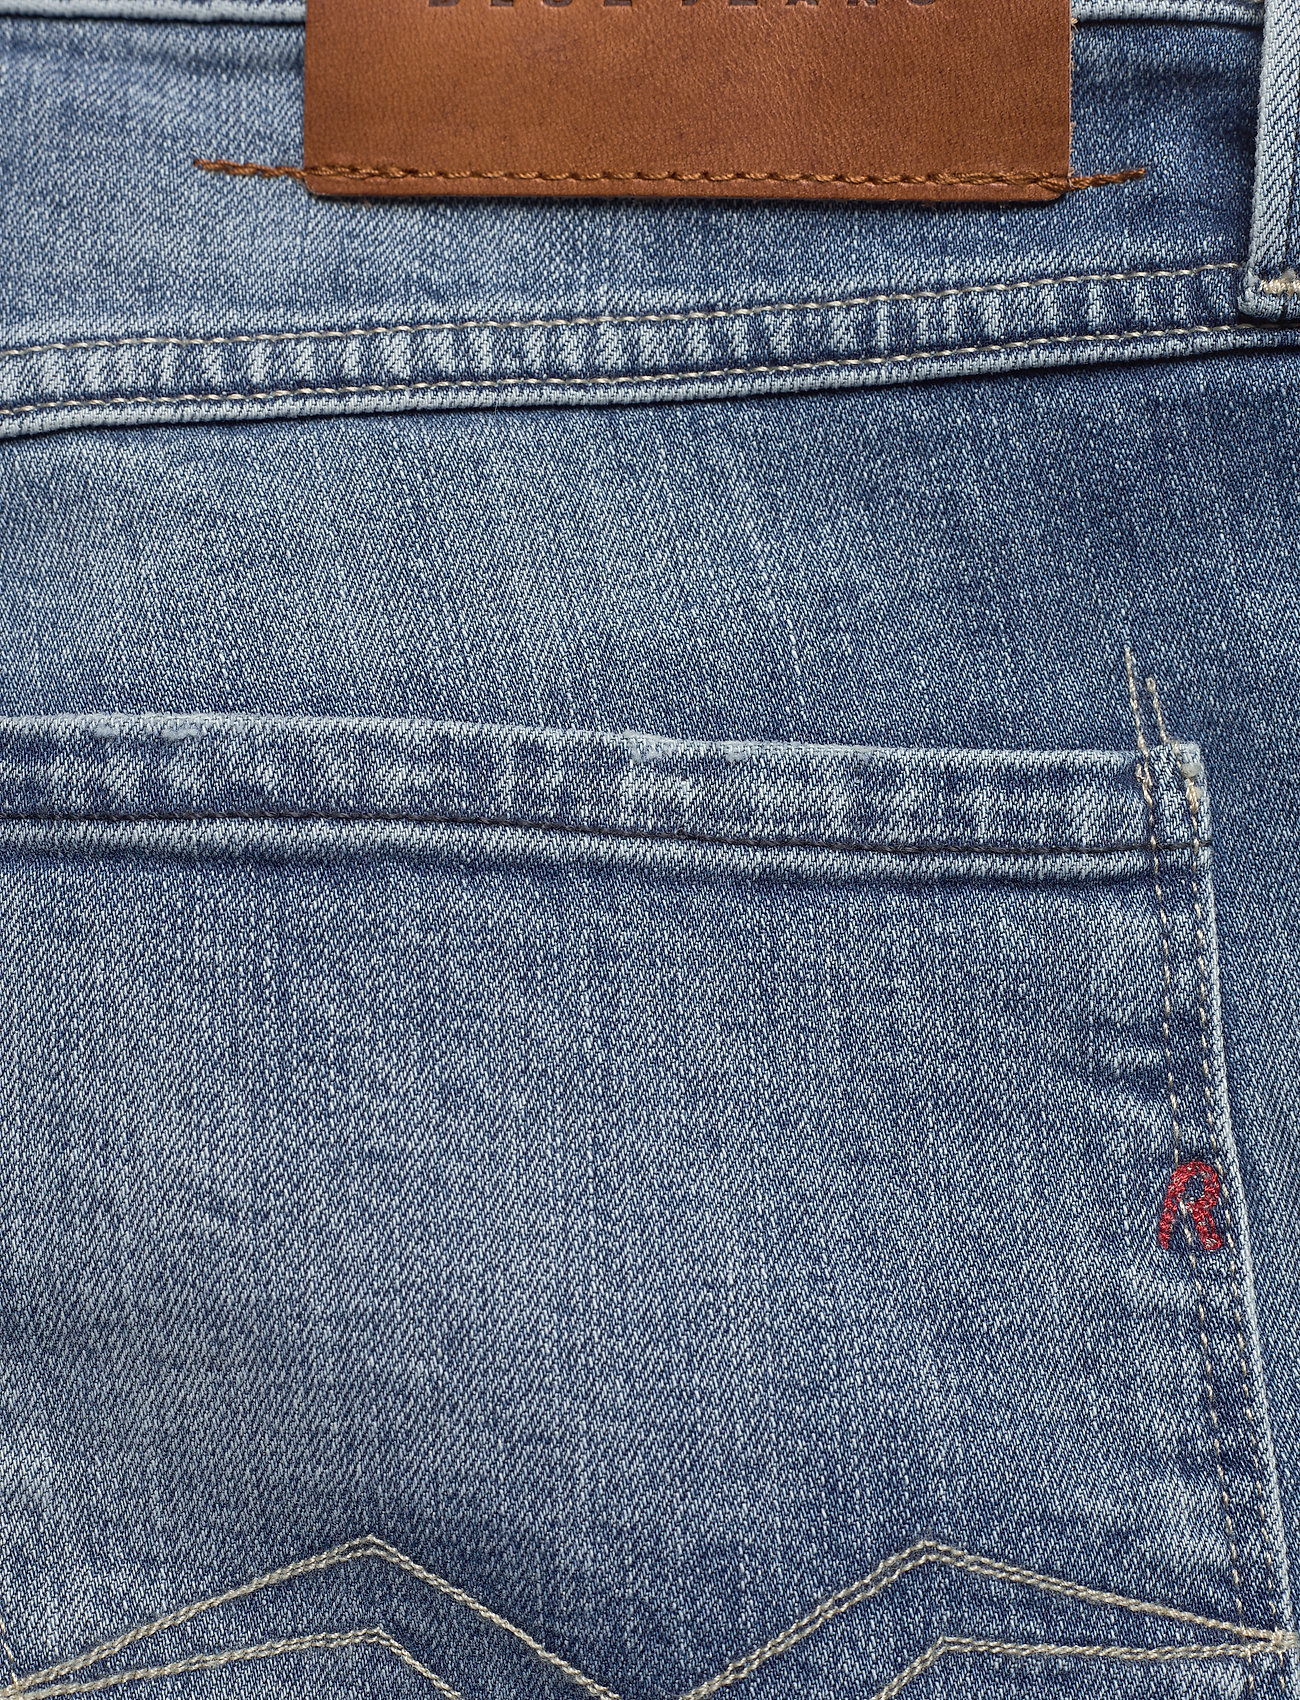 Replay ANBASS - Jeans LIGHT BLUE - Menn Klær